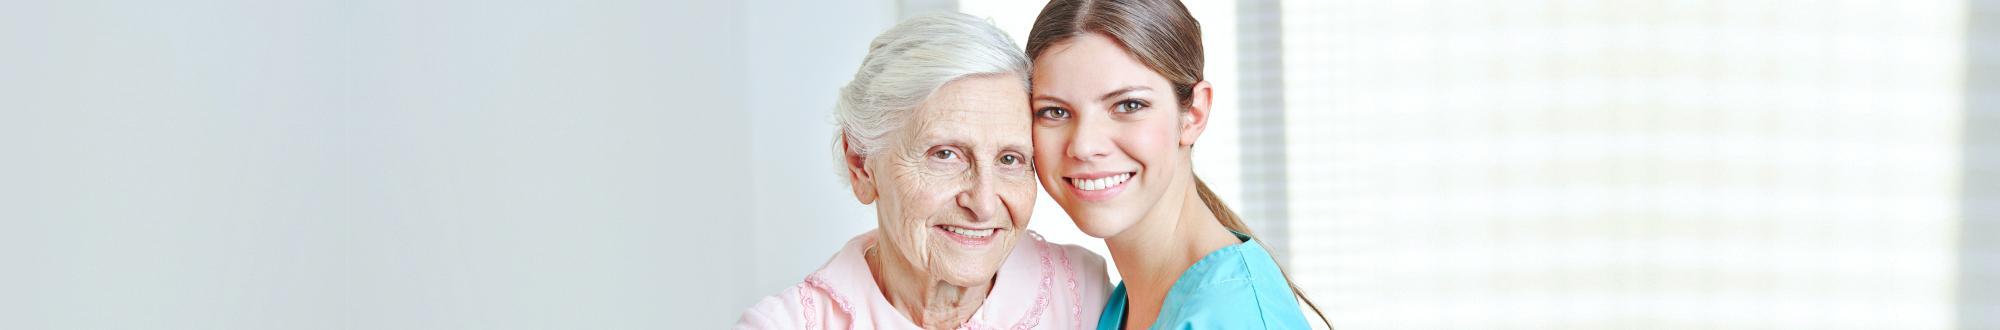 senior woman and female caregiver smiling